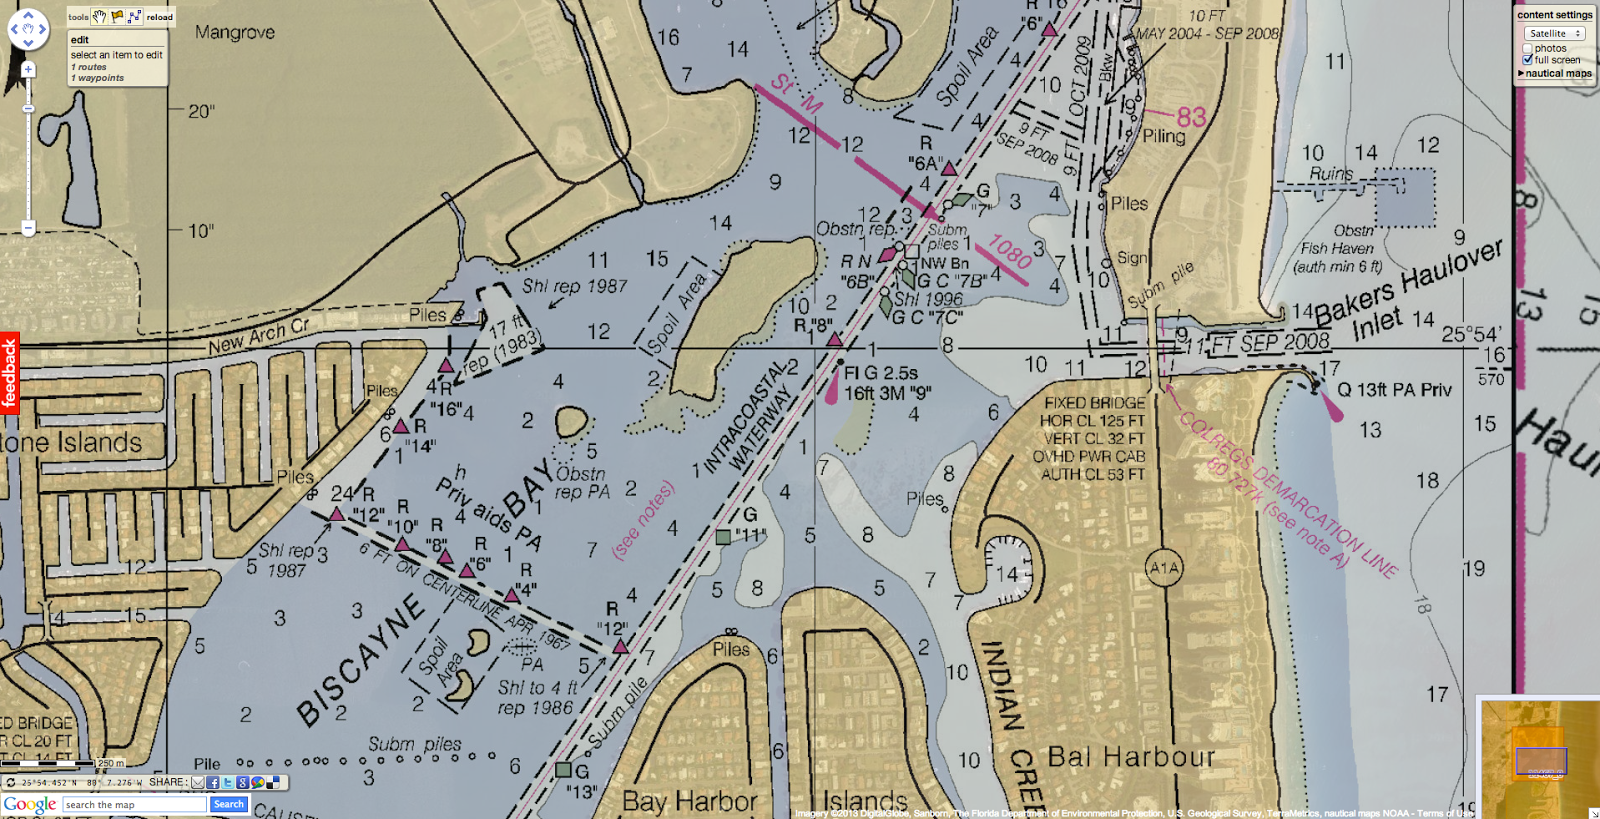 geogarage blog intracoastal waterway route magenta line on noaa